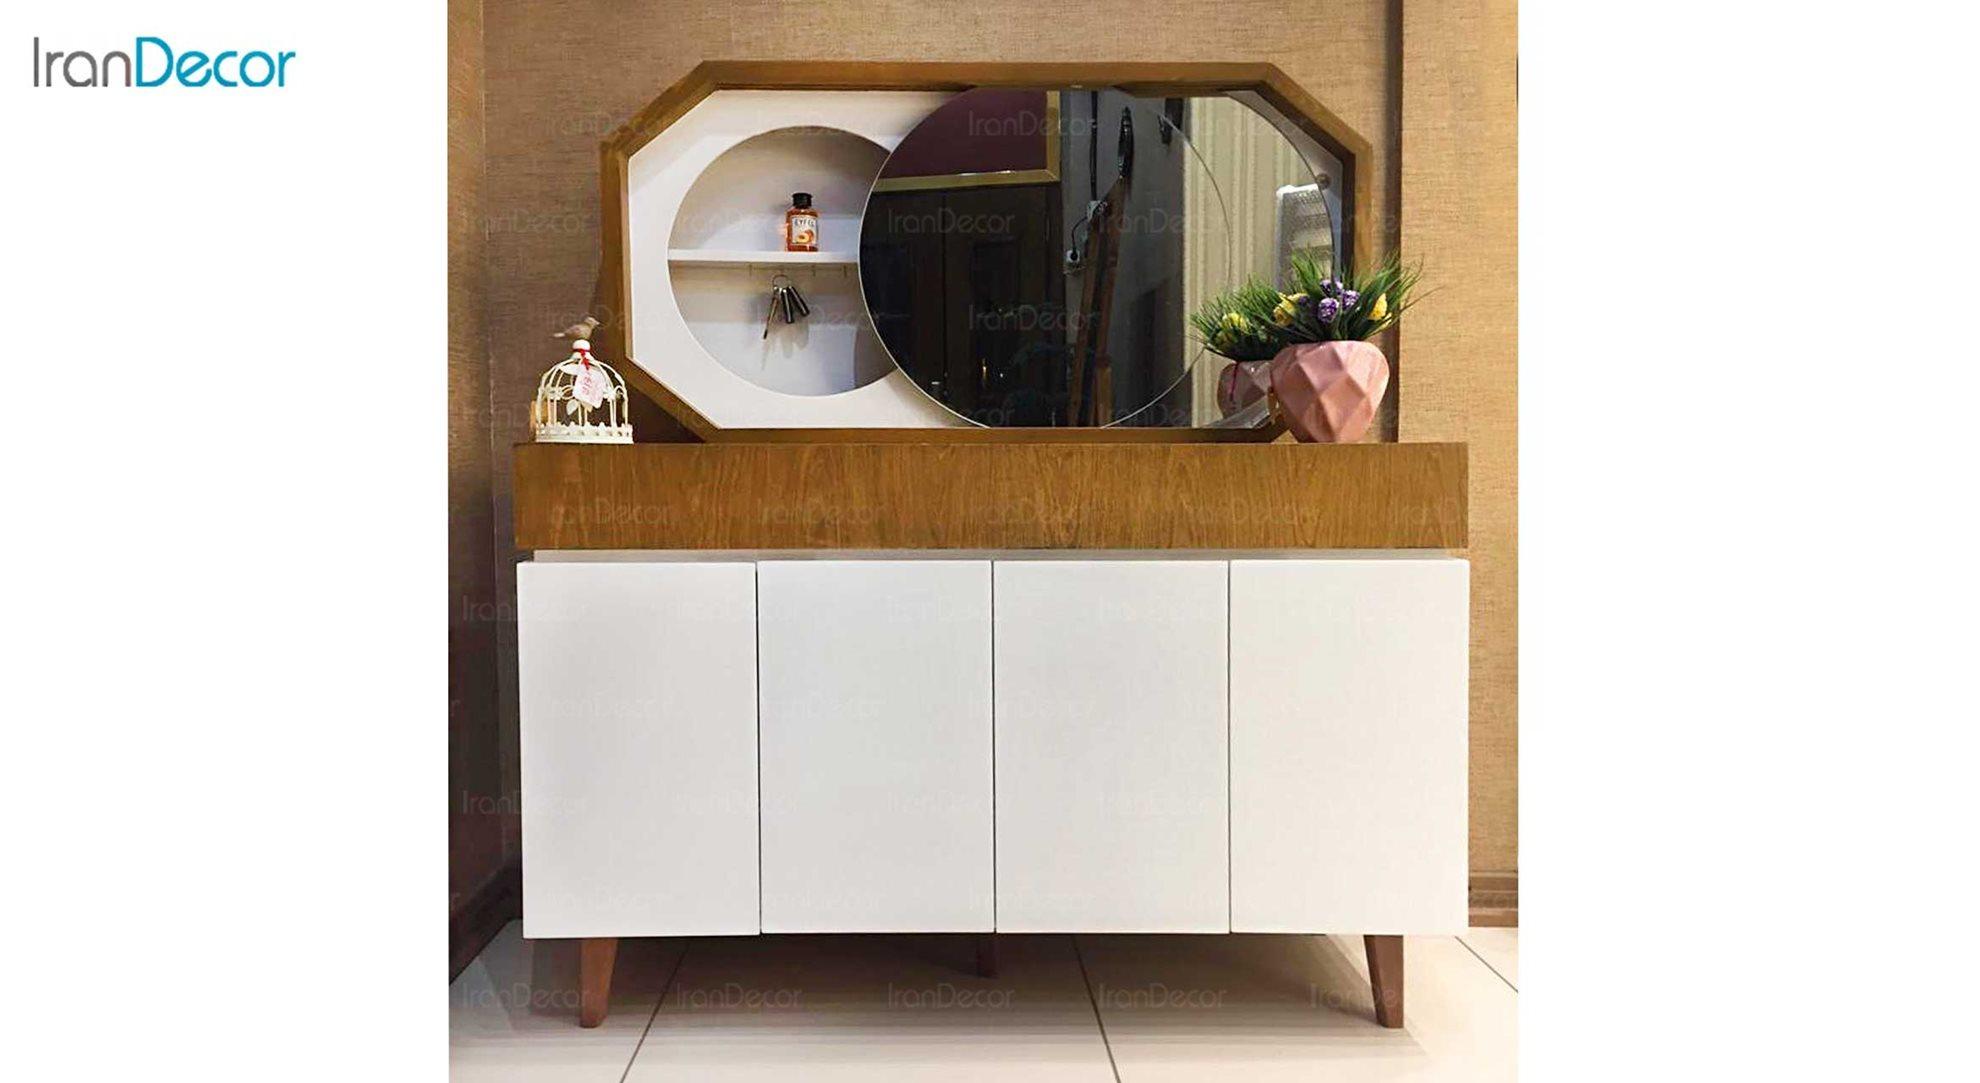 آینه کنسول چوبی آرون مدل هرمس